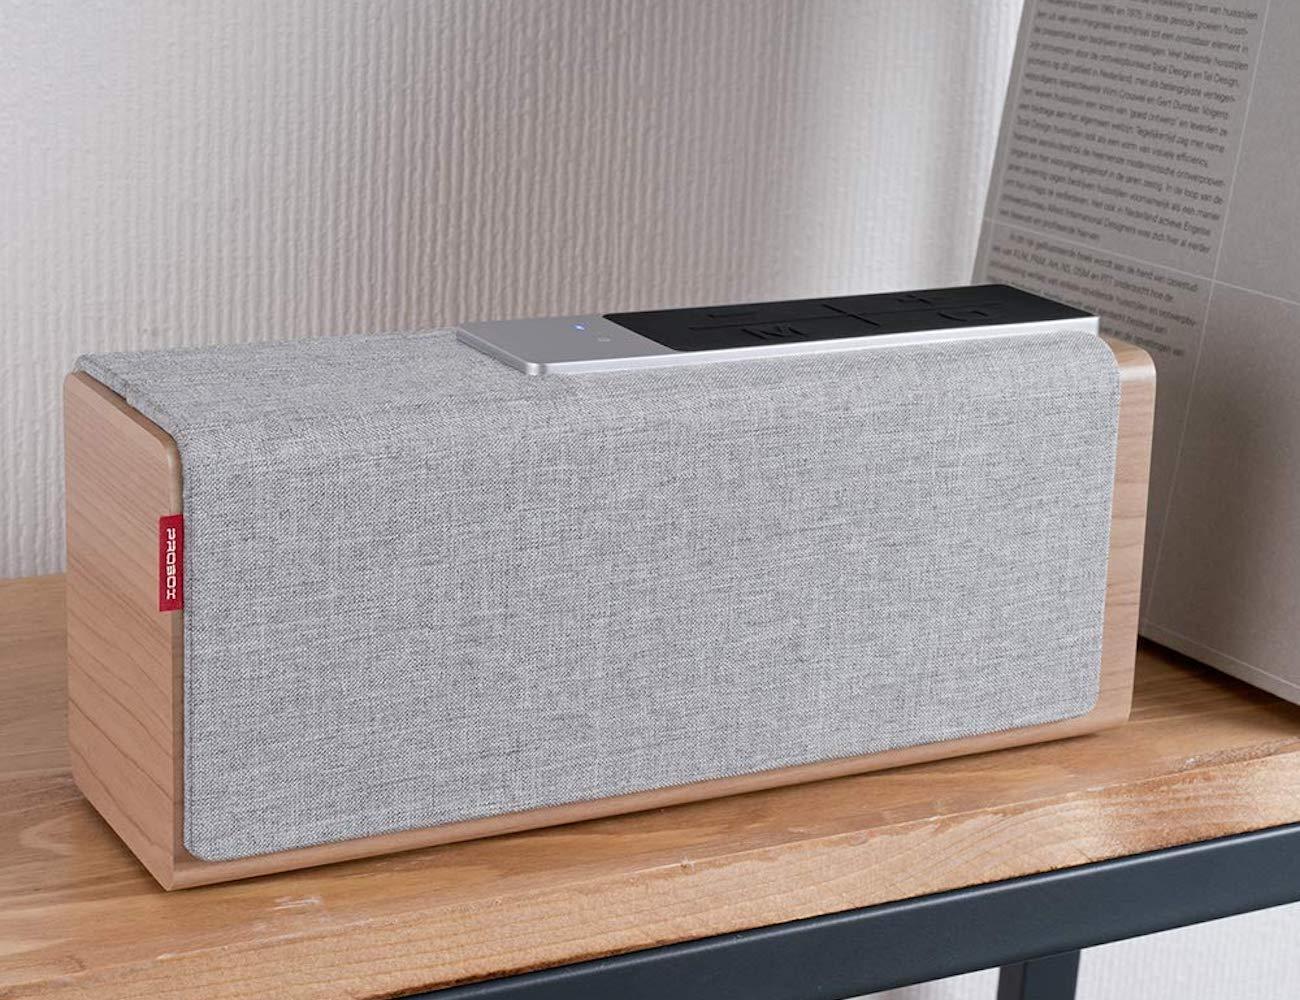 Mediasonic TEANA SOUND Wooden Bluetooth Speaker makes your music sound better